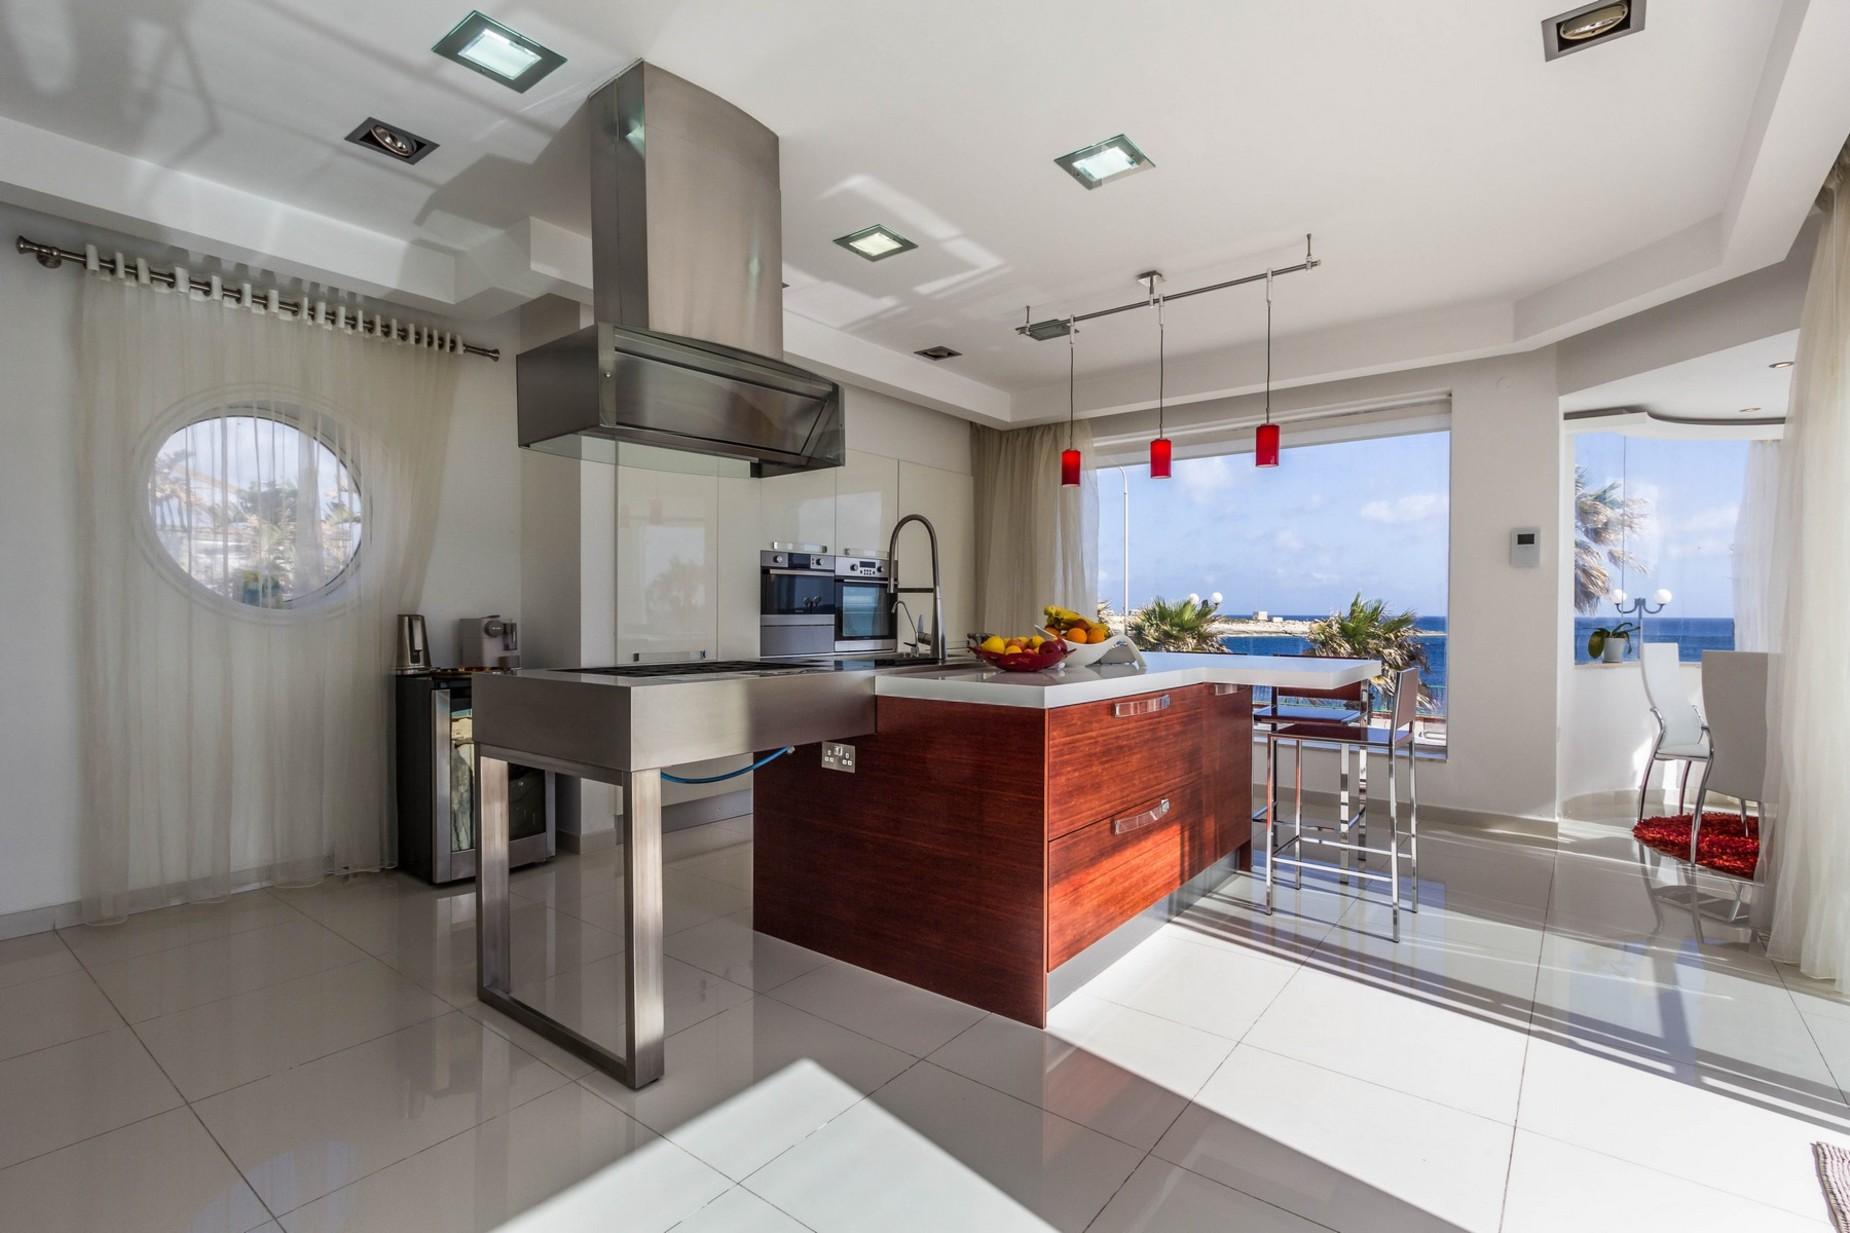 4 bed Villa For Rent in Marsascala, Marsascala - thumb 4